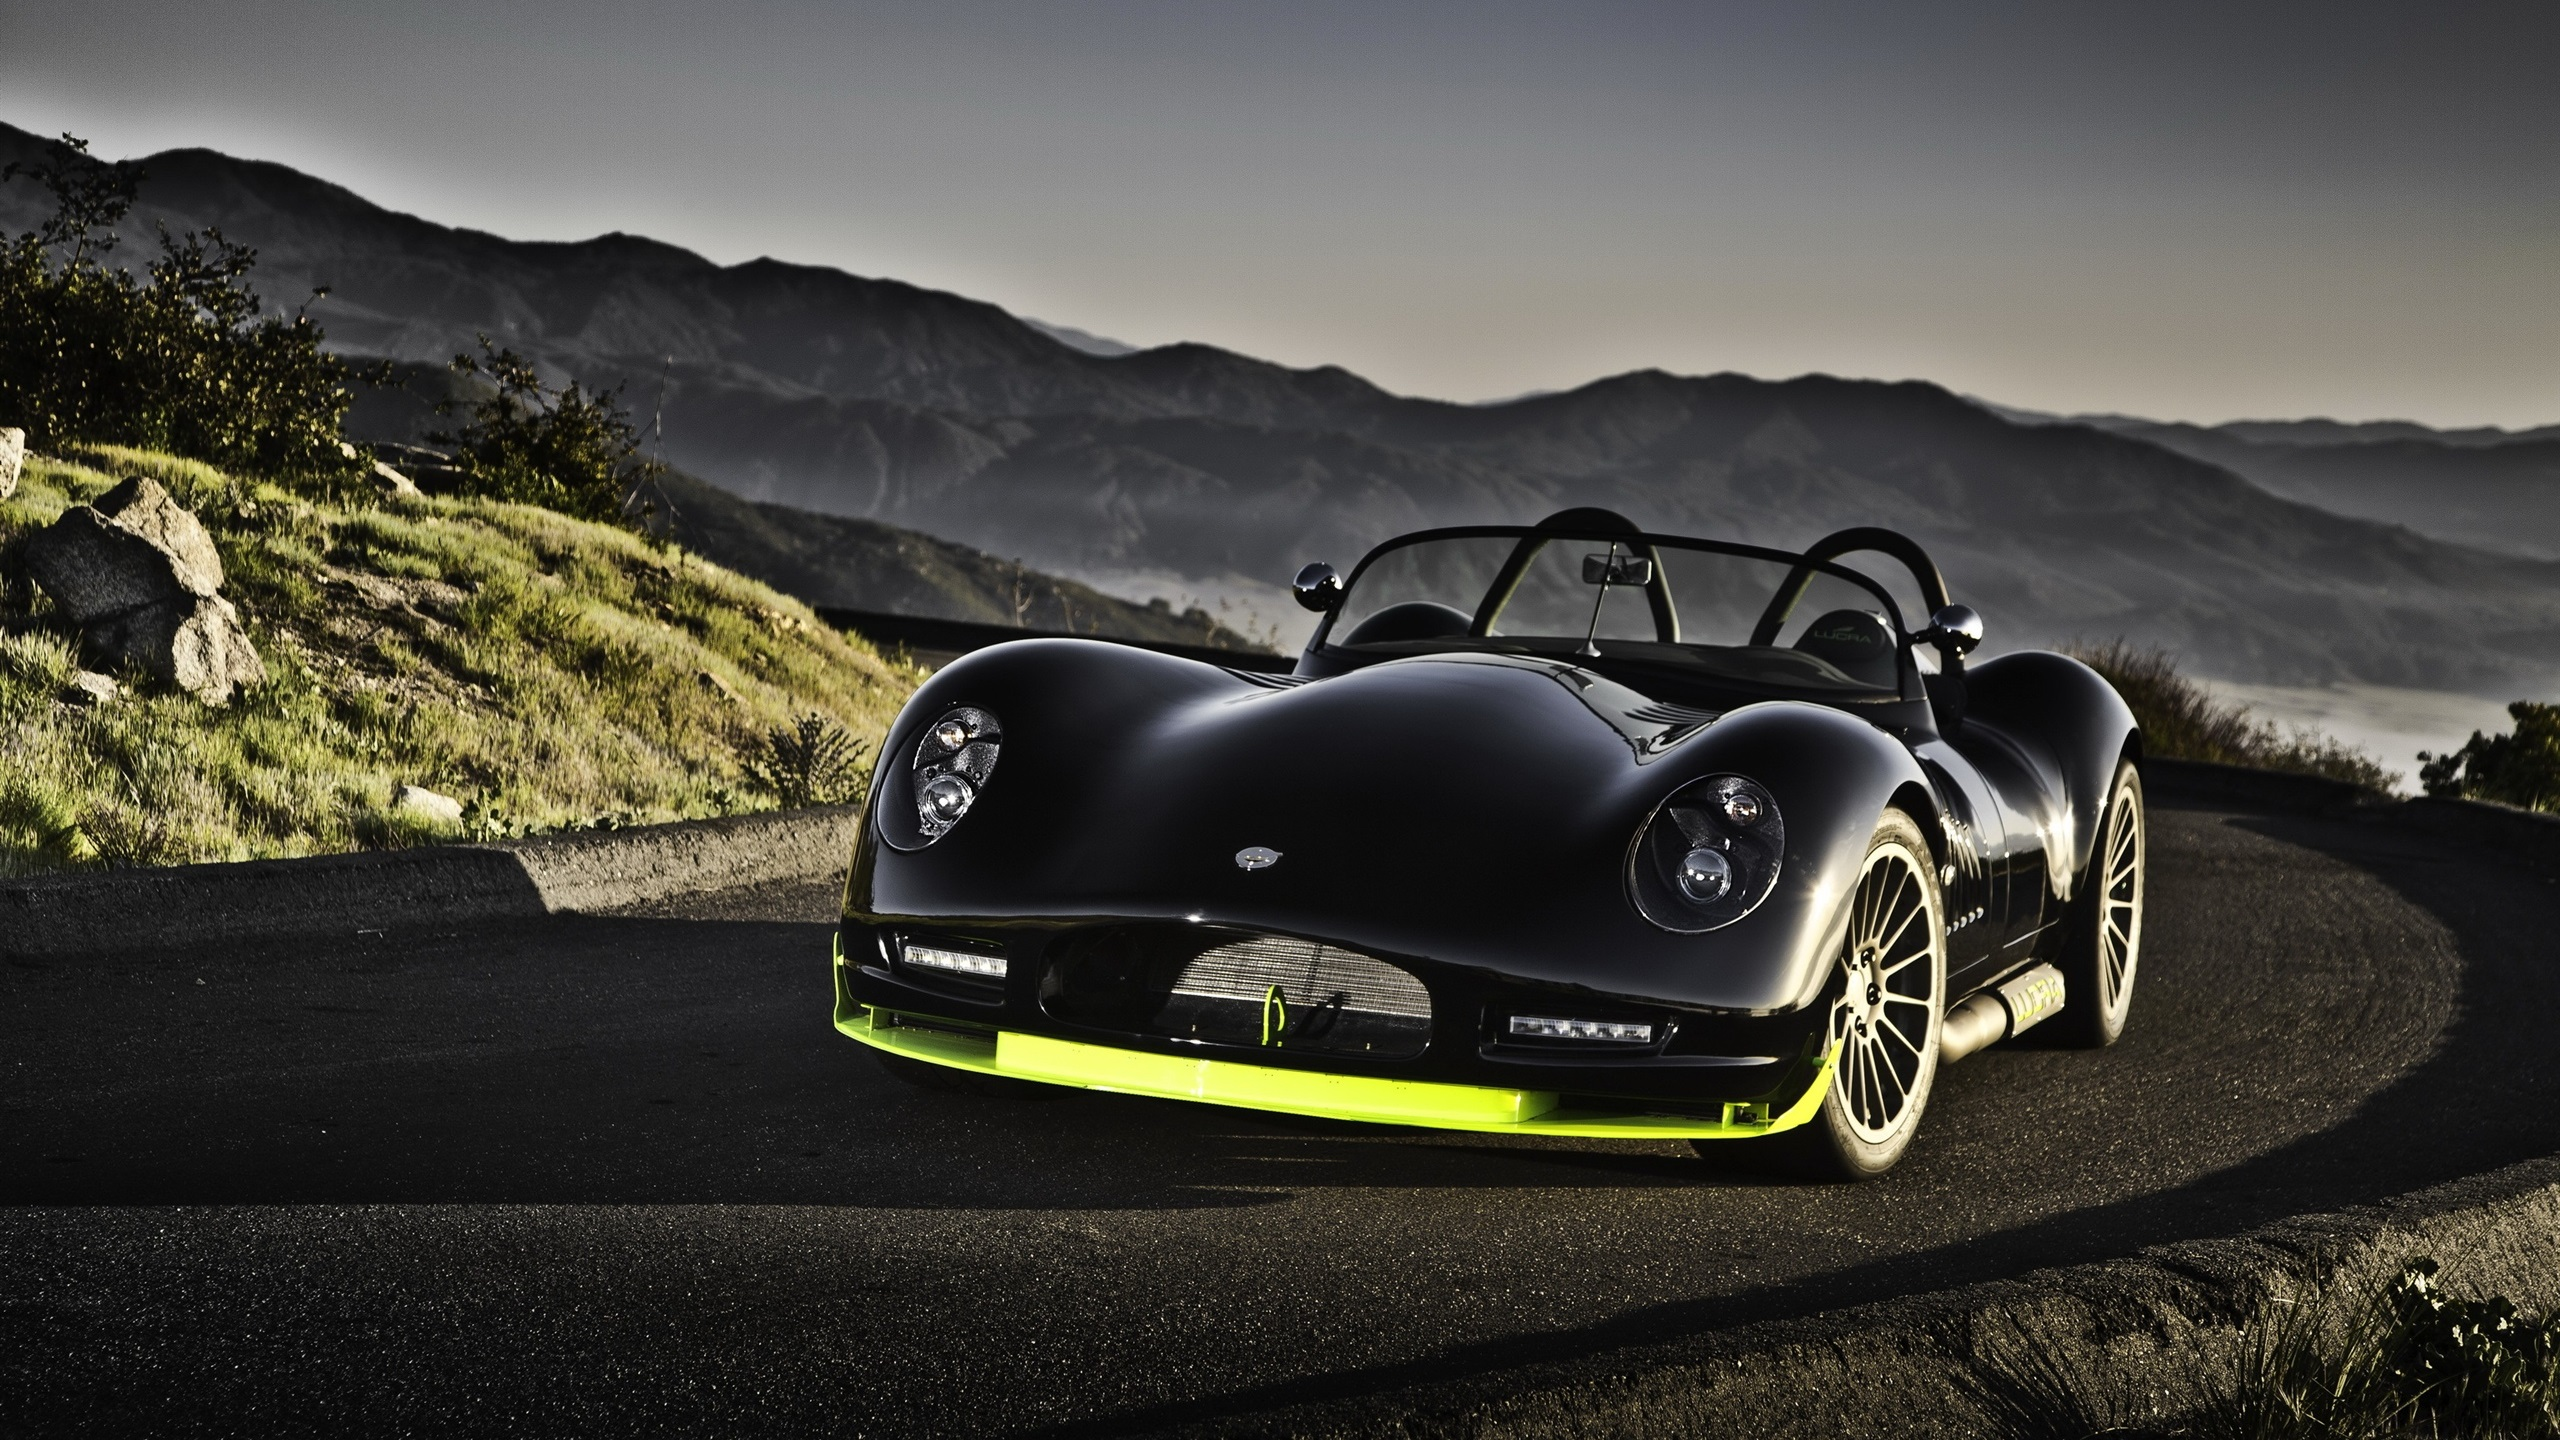 Lucra lc470 voiture noire fonds d 39 cran 2560x1440 qhd for Fond ecran qhd